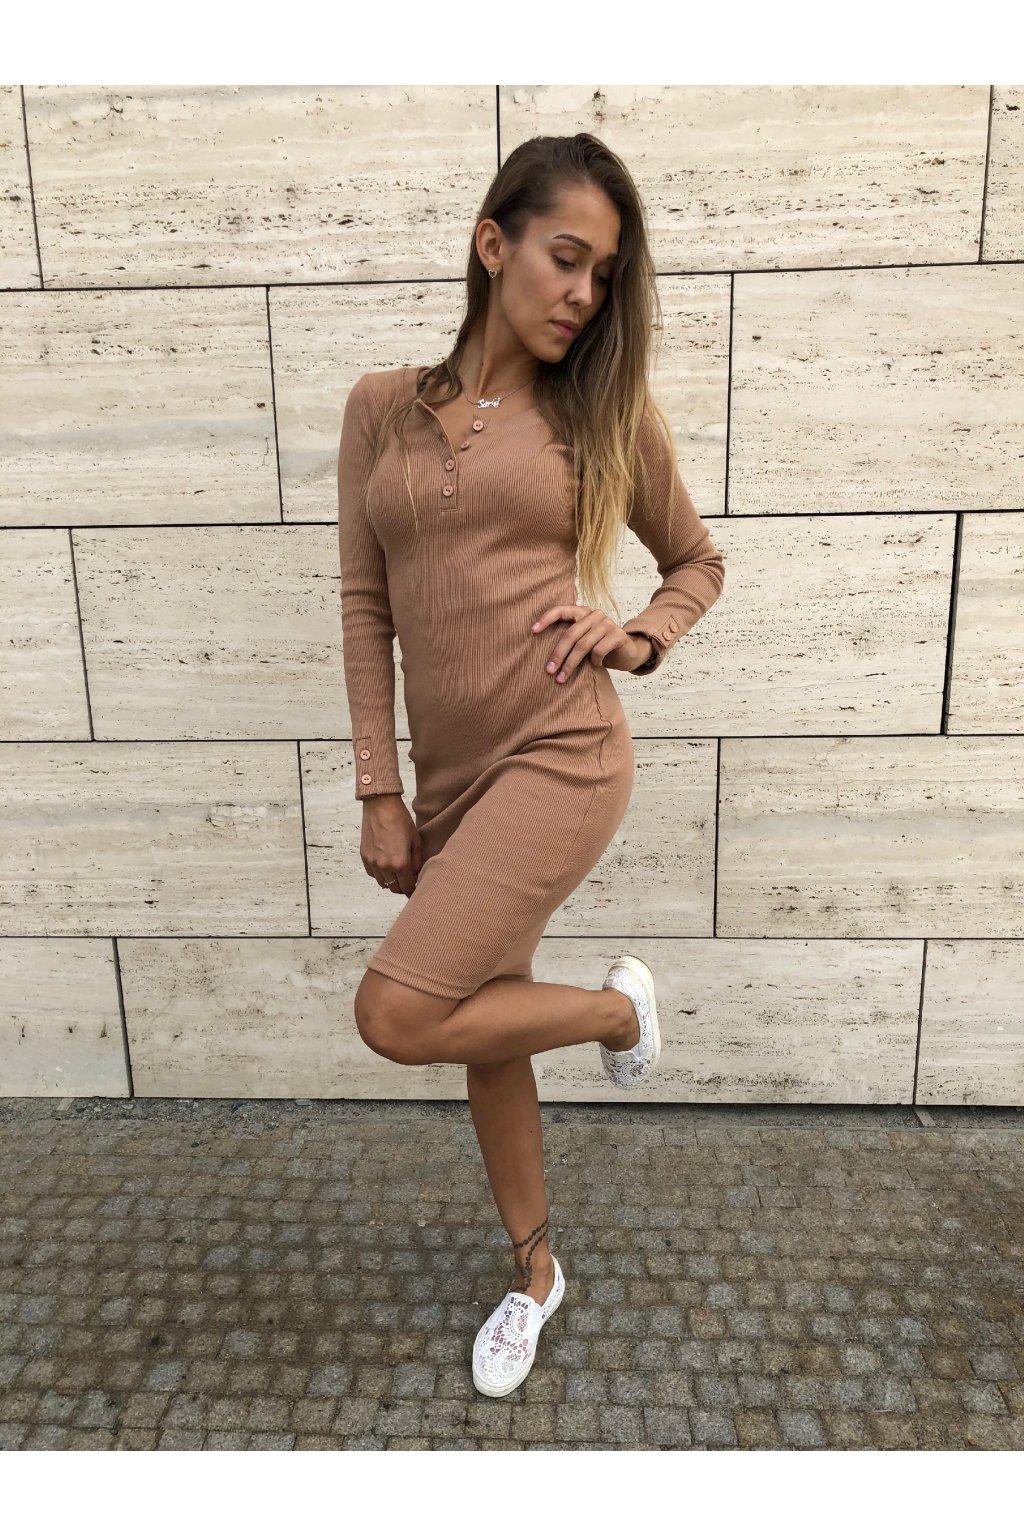 damske saty miss caramel eshopat cz 5